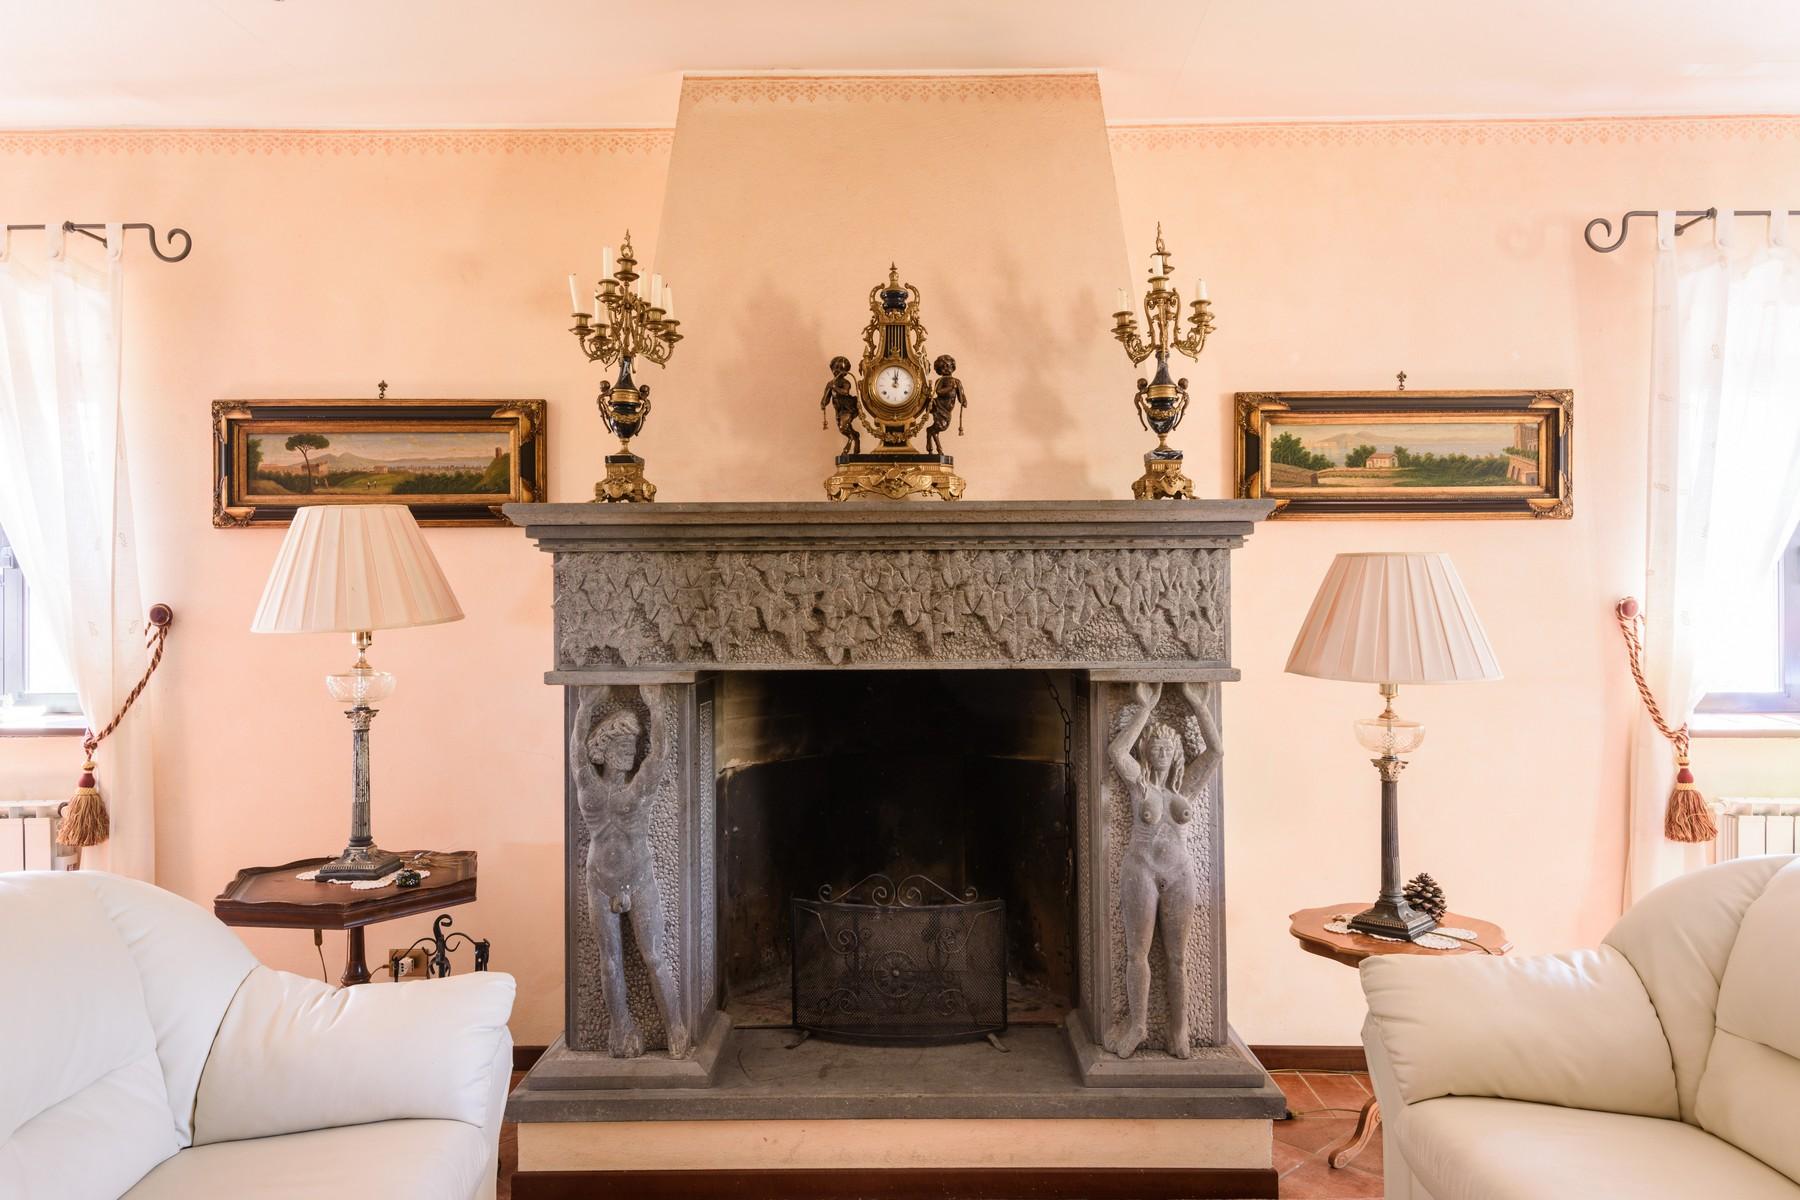 Casa indipendente in Vendita a Castel Viscardo: 5 locali, 700 mq - Foto 7